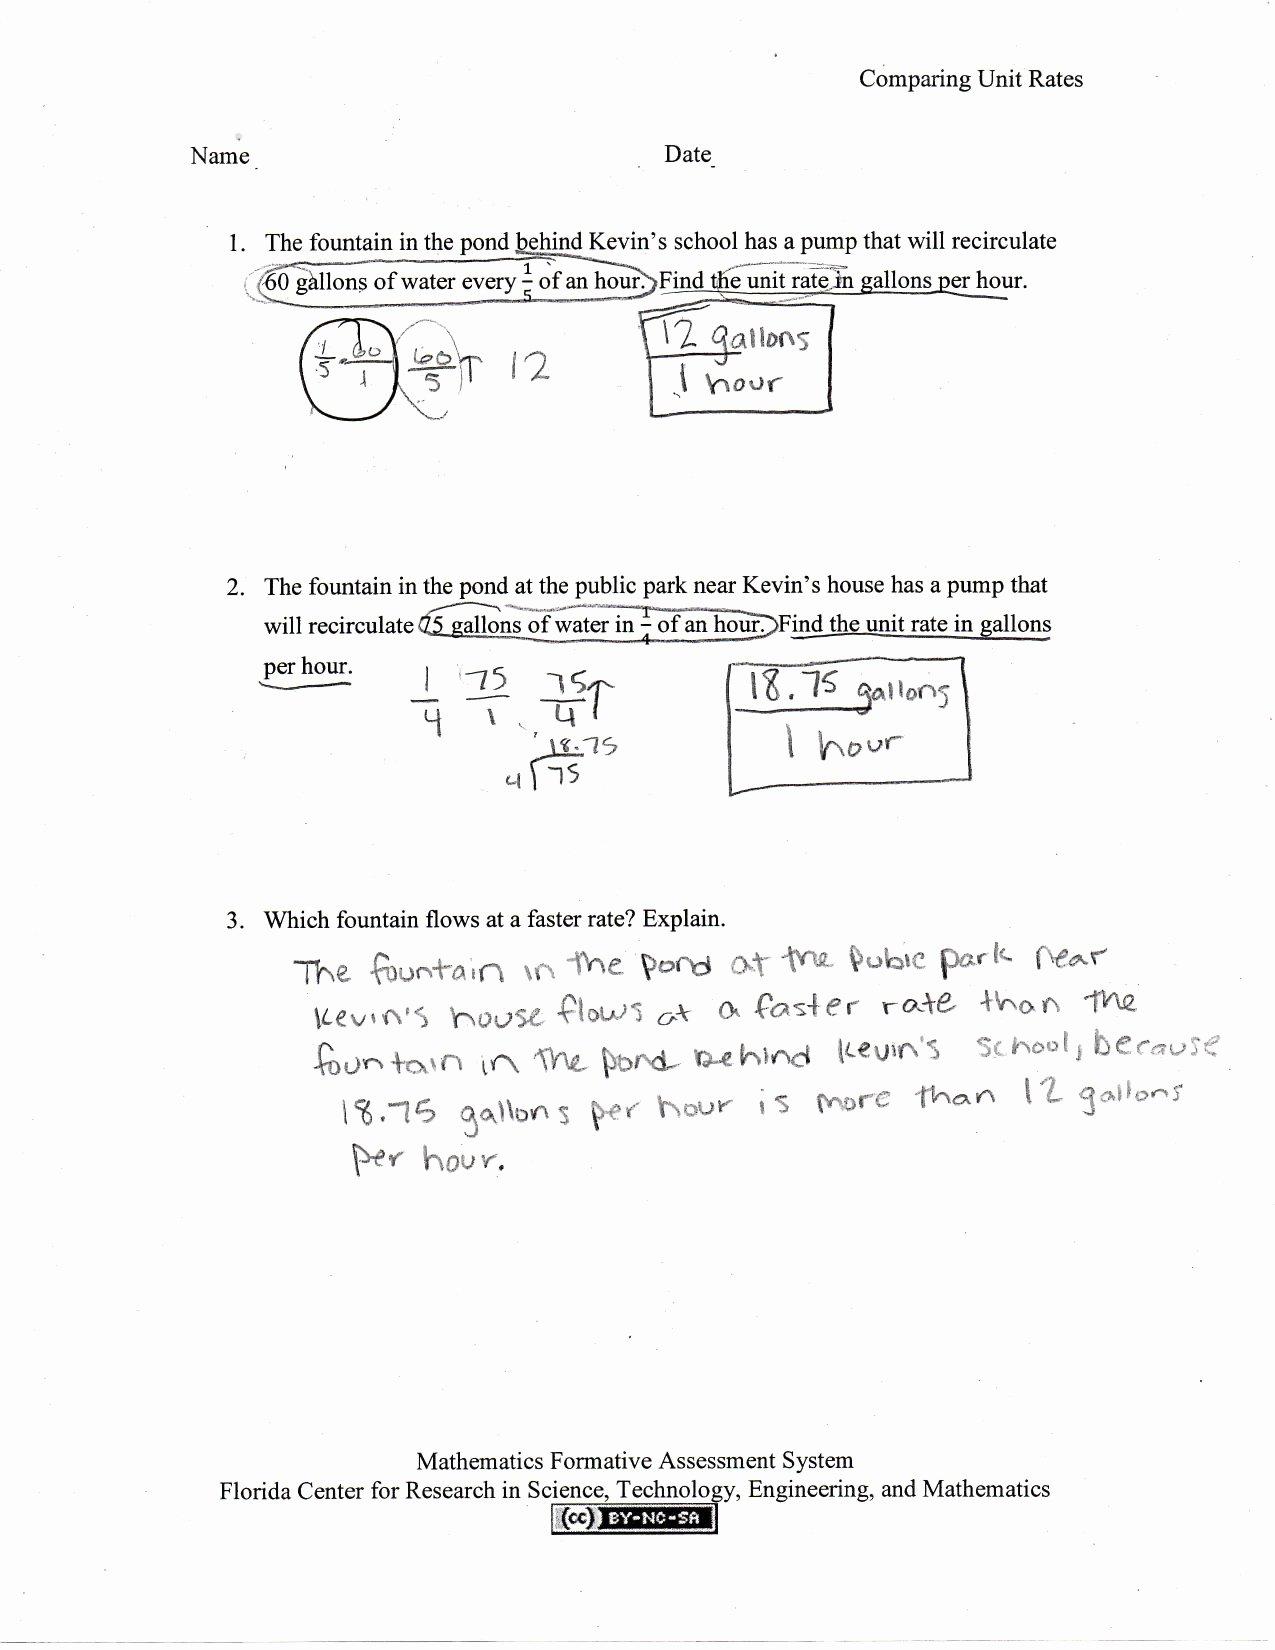 Finding Unit Rates Worksheet Inspirational Paring Unit